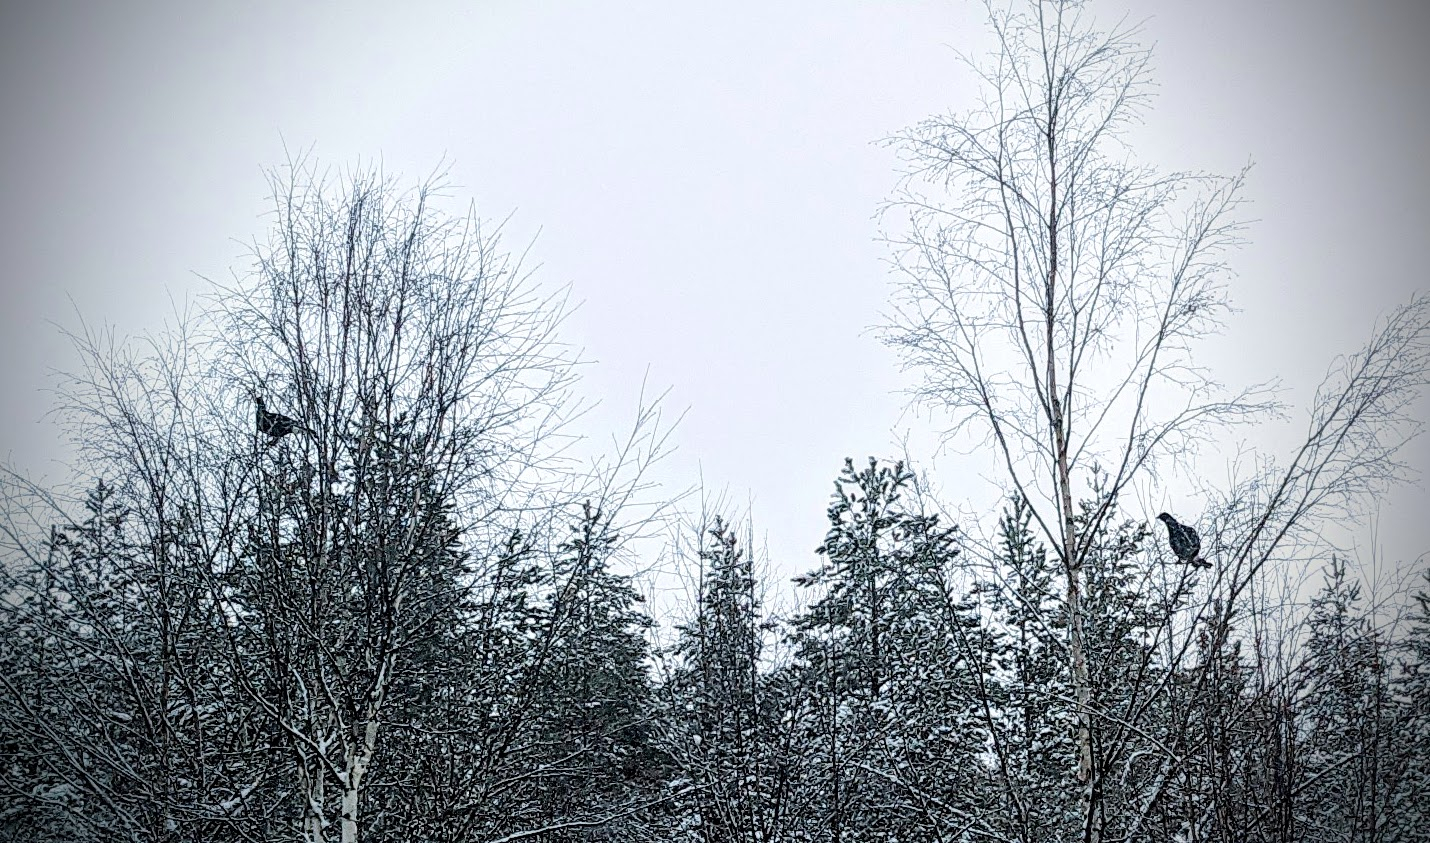 Teeret puussa tien varrella